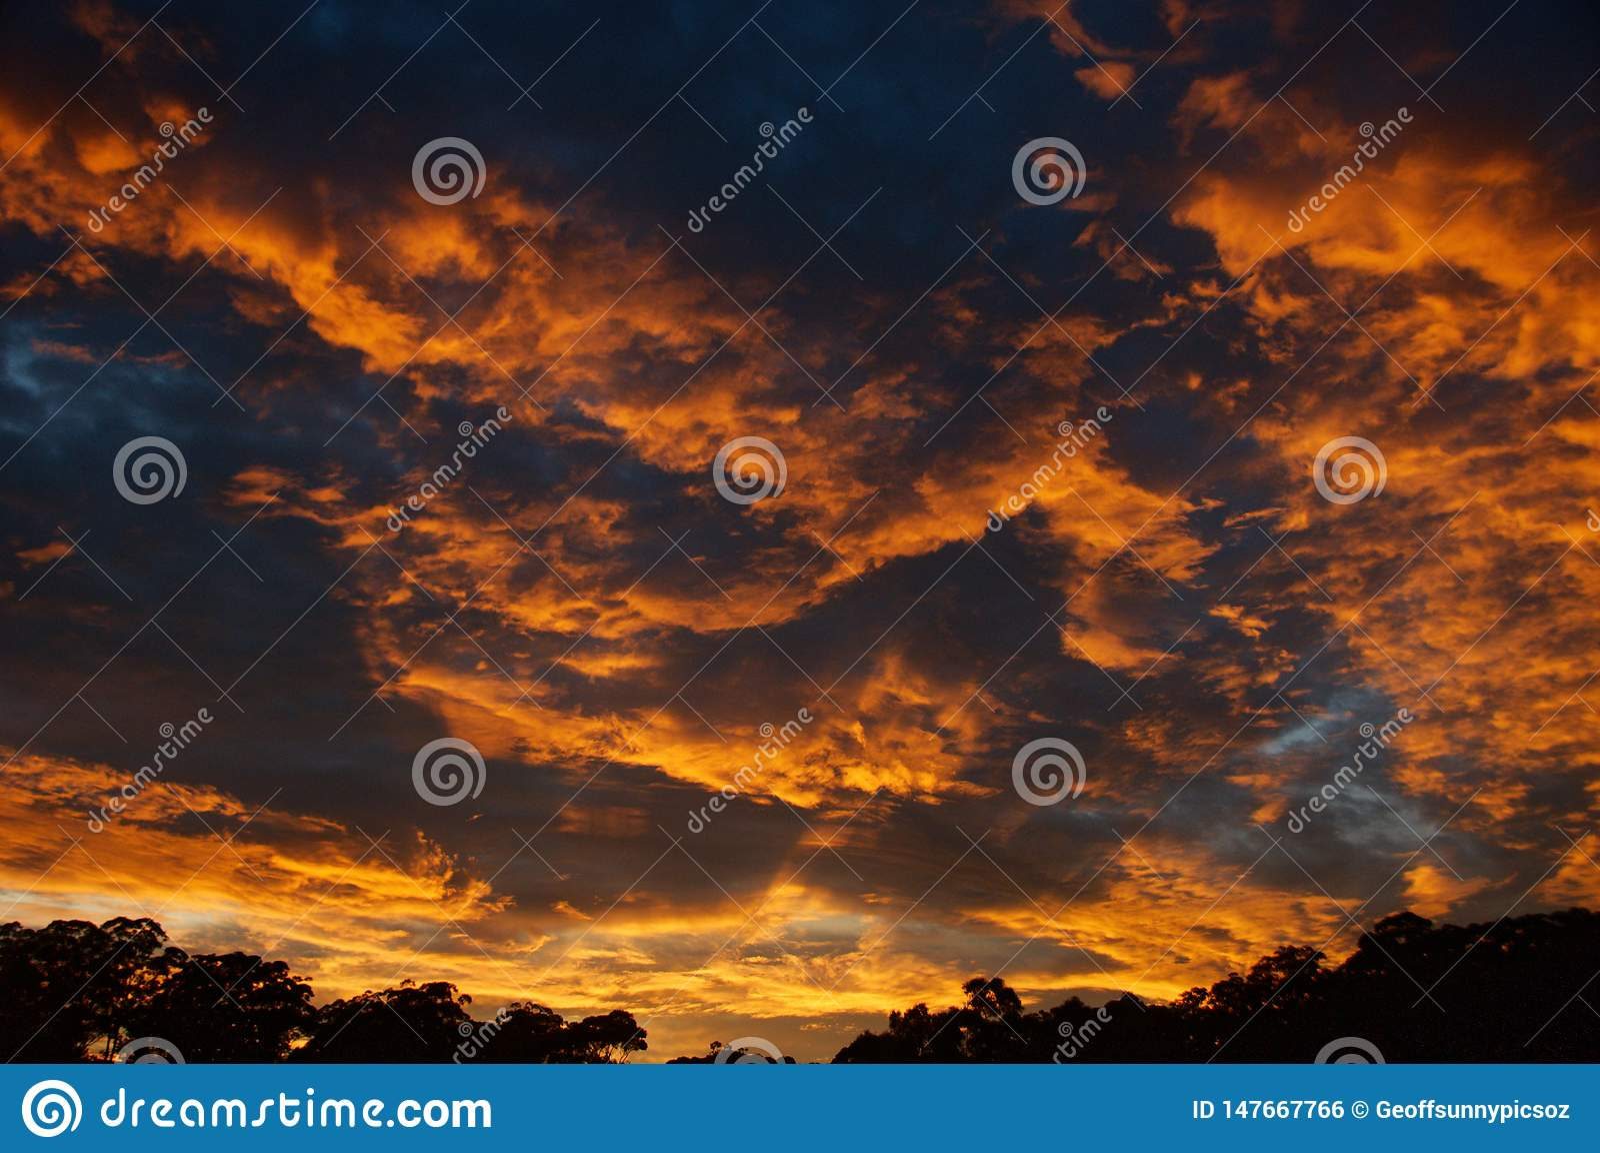 Dramatische sinaasappel gekleurde stratocumuluszonsopgang cloudscape